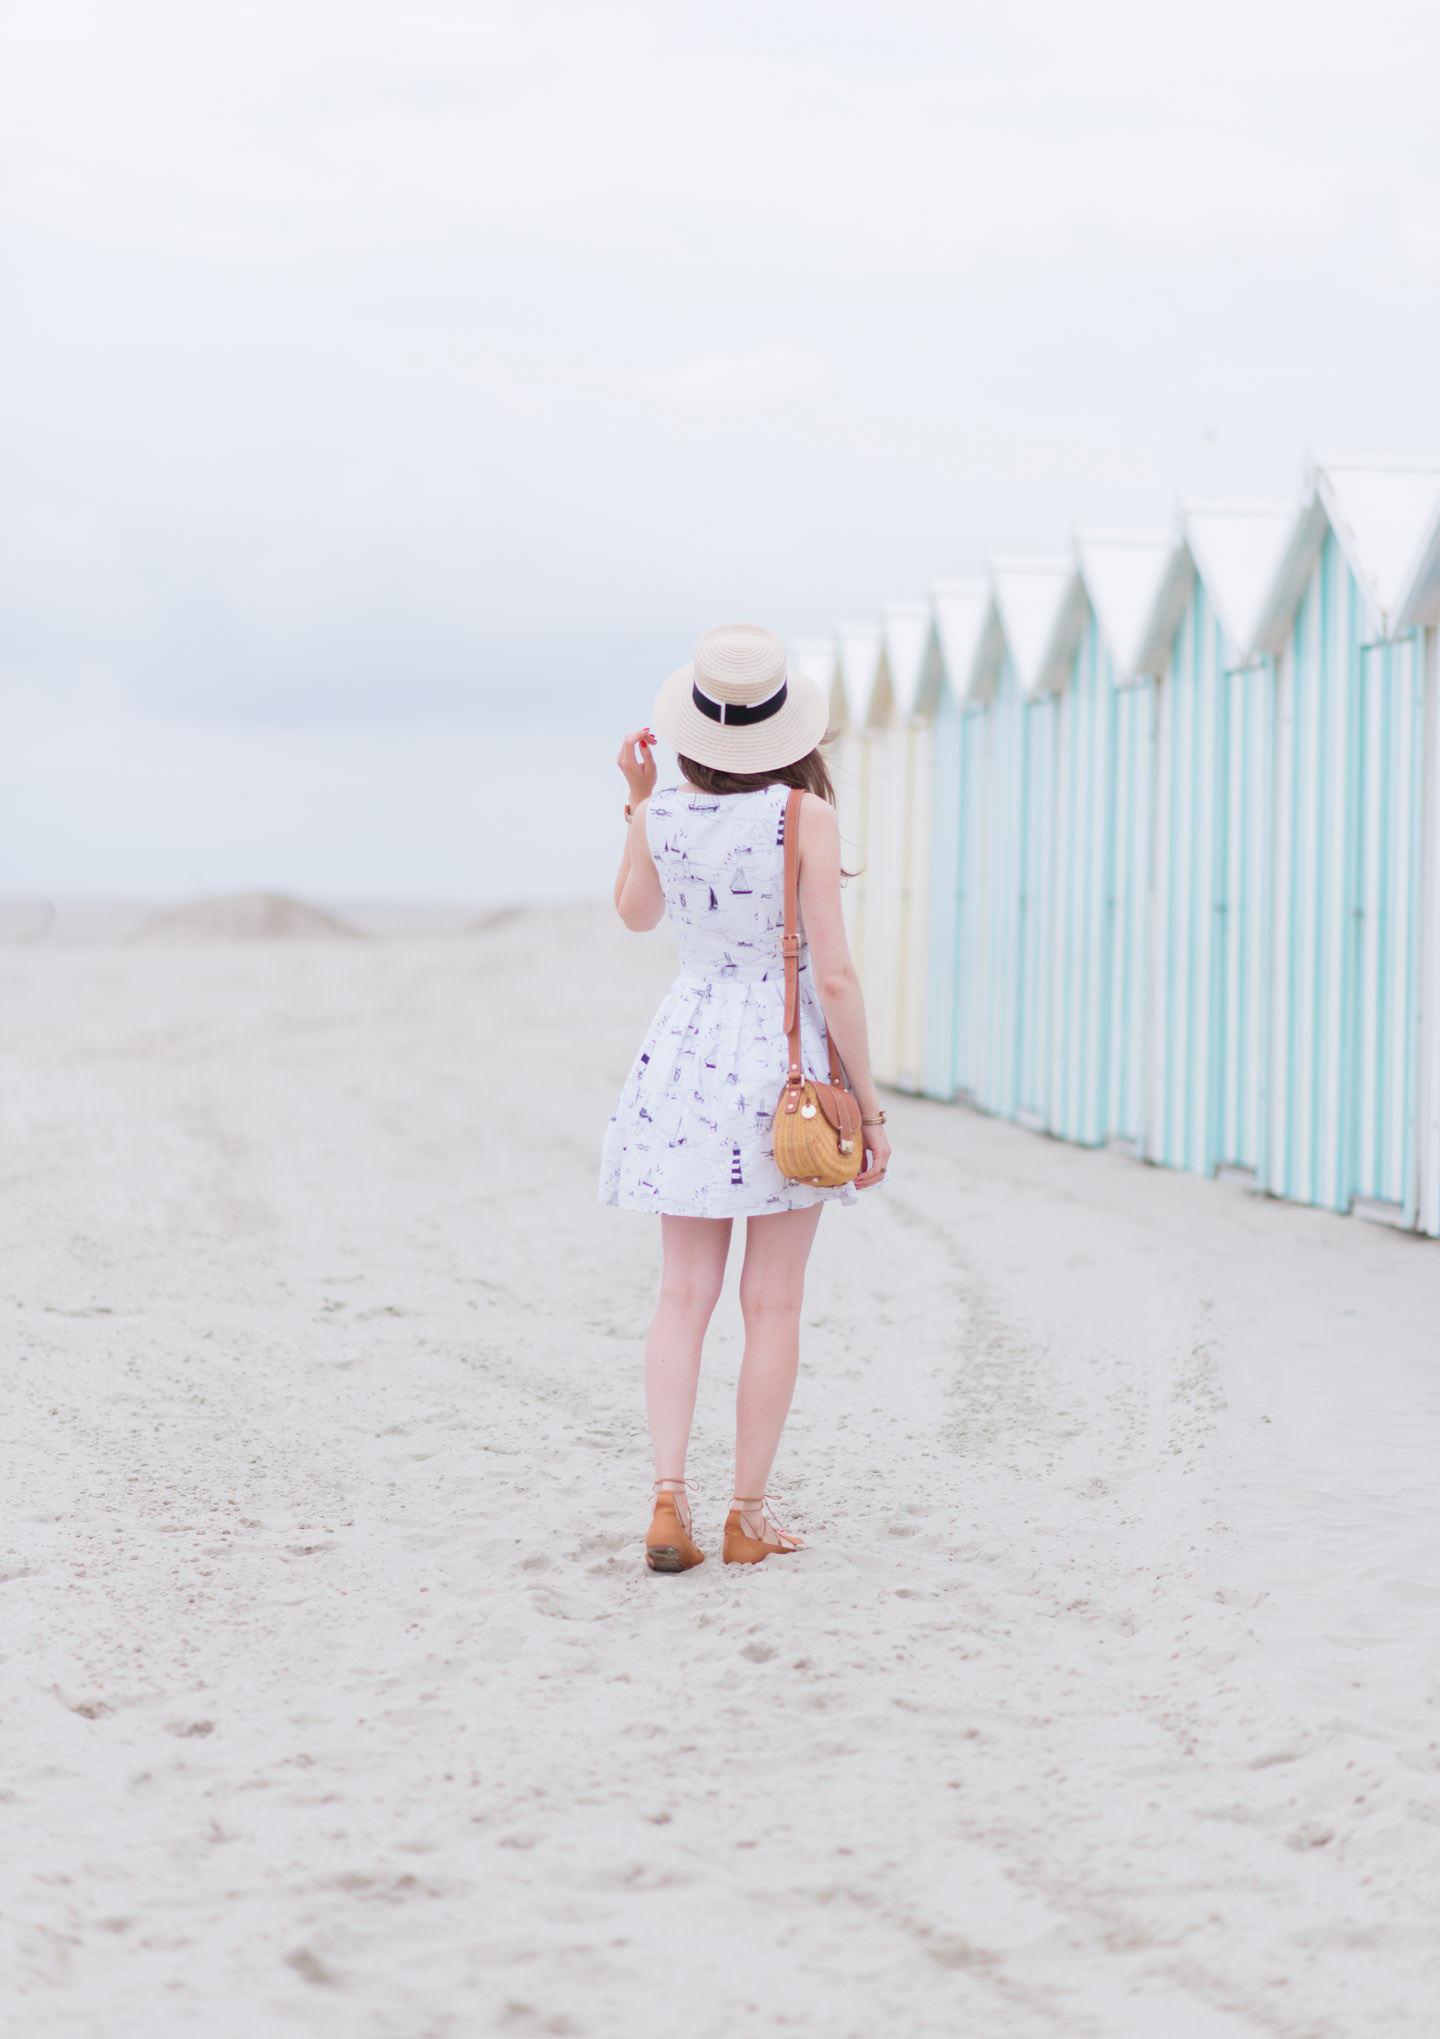 Blog-Mode-And-The-City-Looks-La-Robe-Ete-Parfaite-4